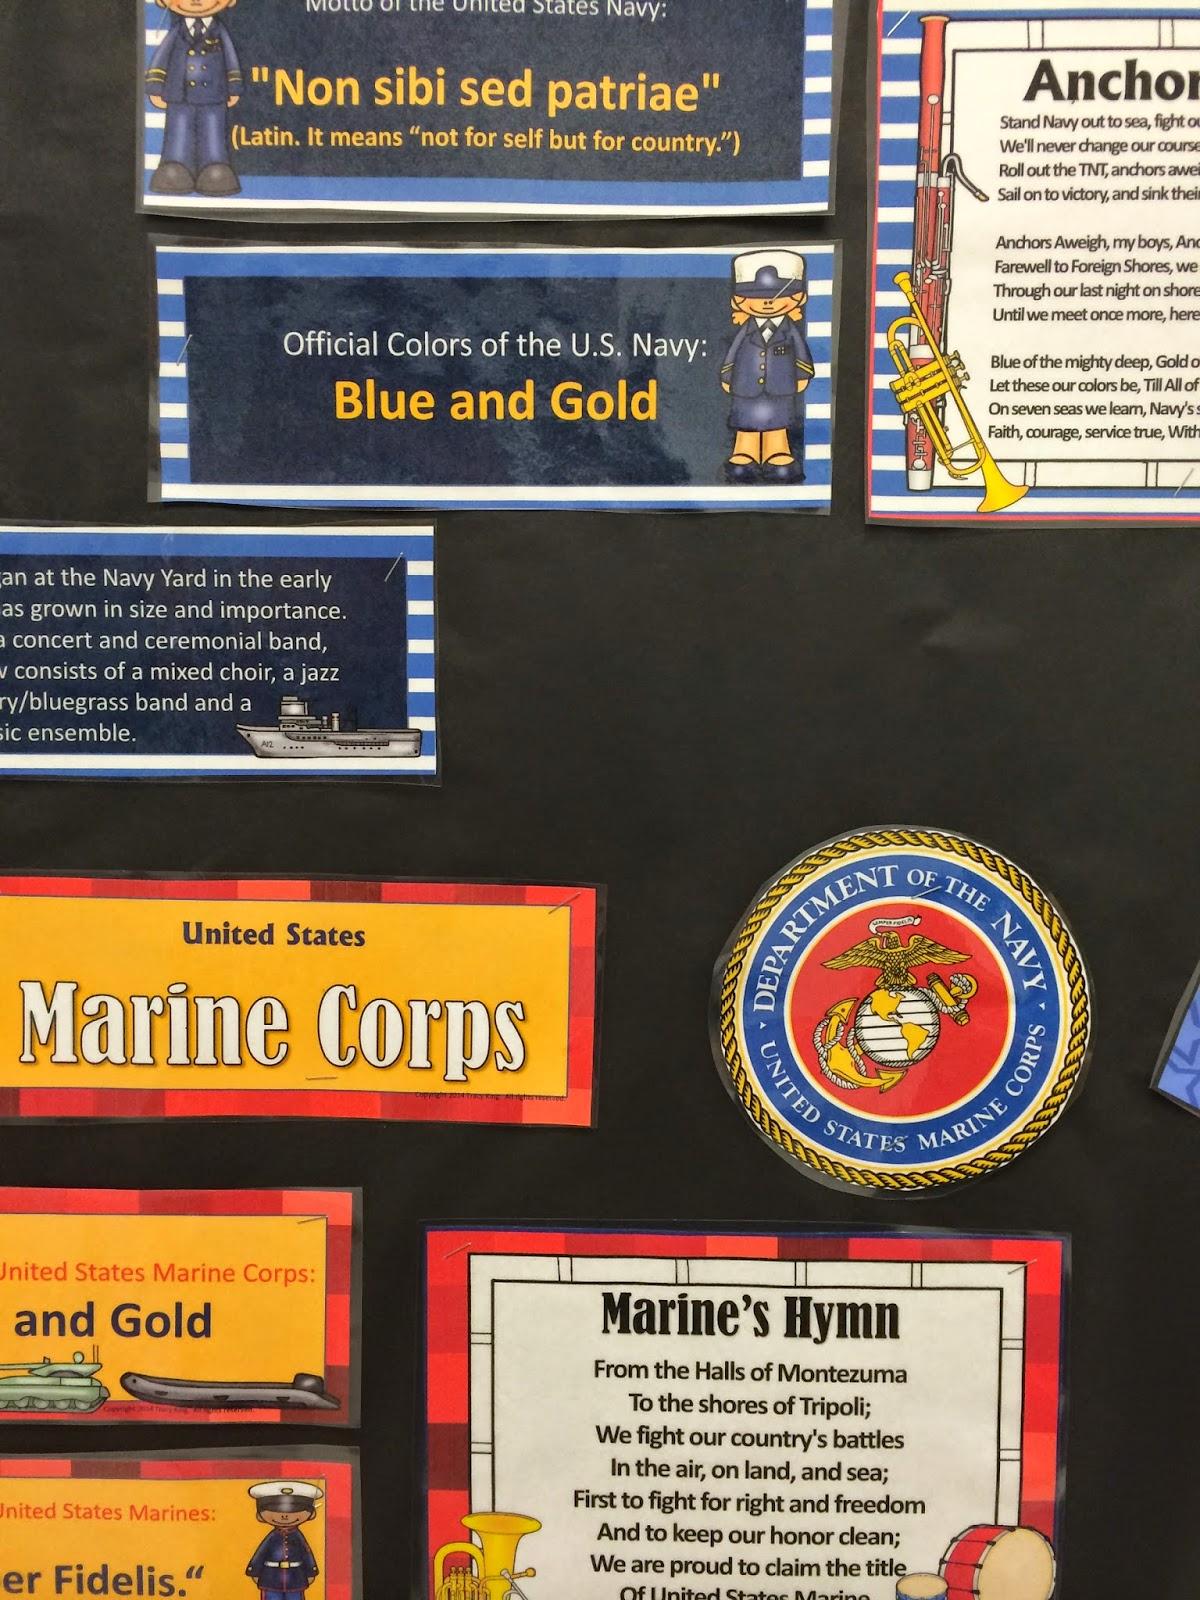 http://www.teacherspayteachers.com/Product/Armed-Forces-Bulletin-Board-Bundle-of-5-Sets-1505980